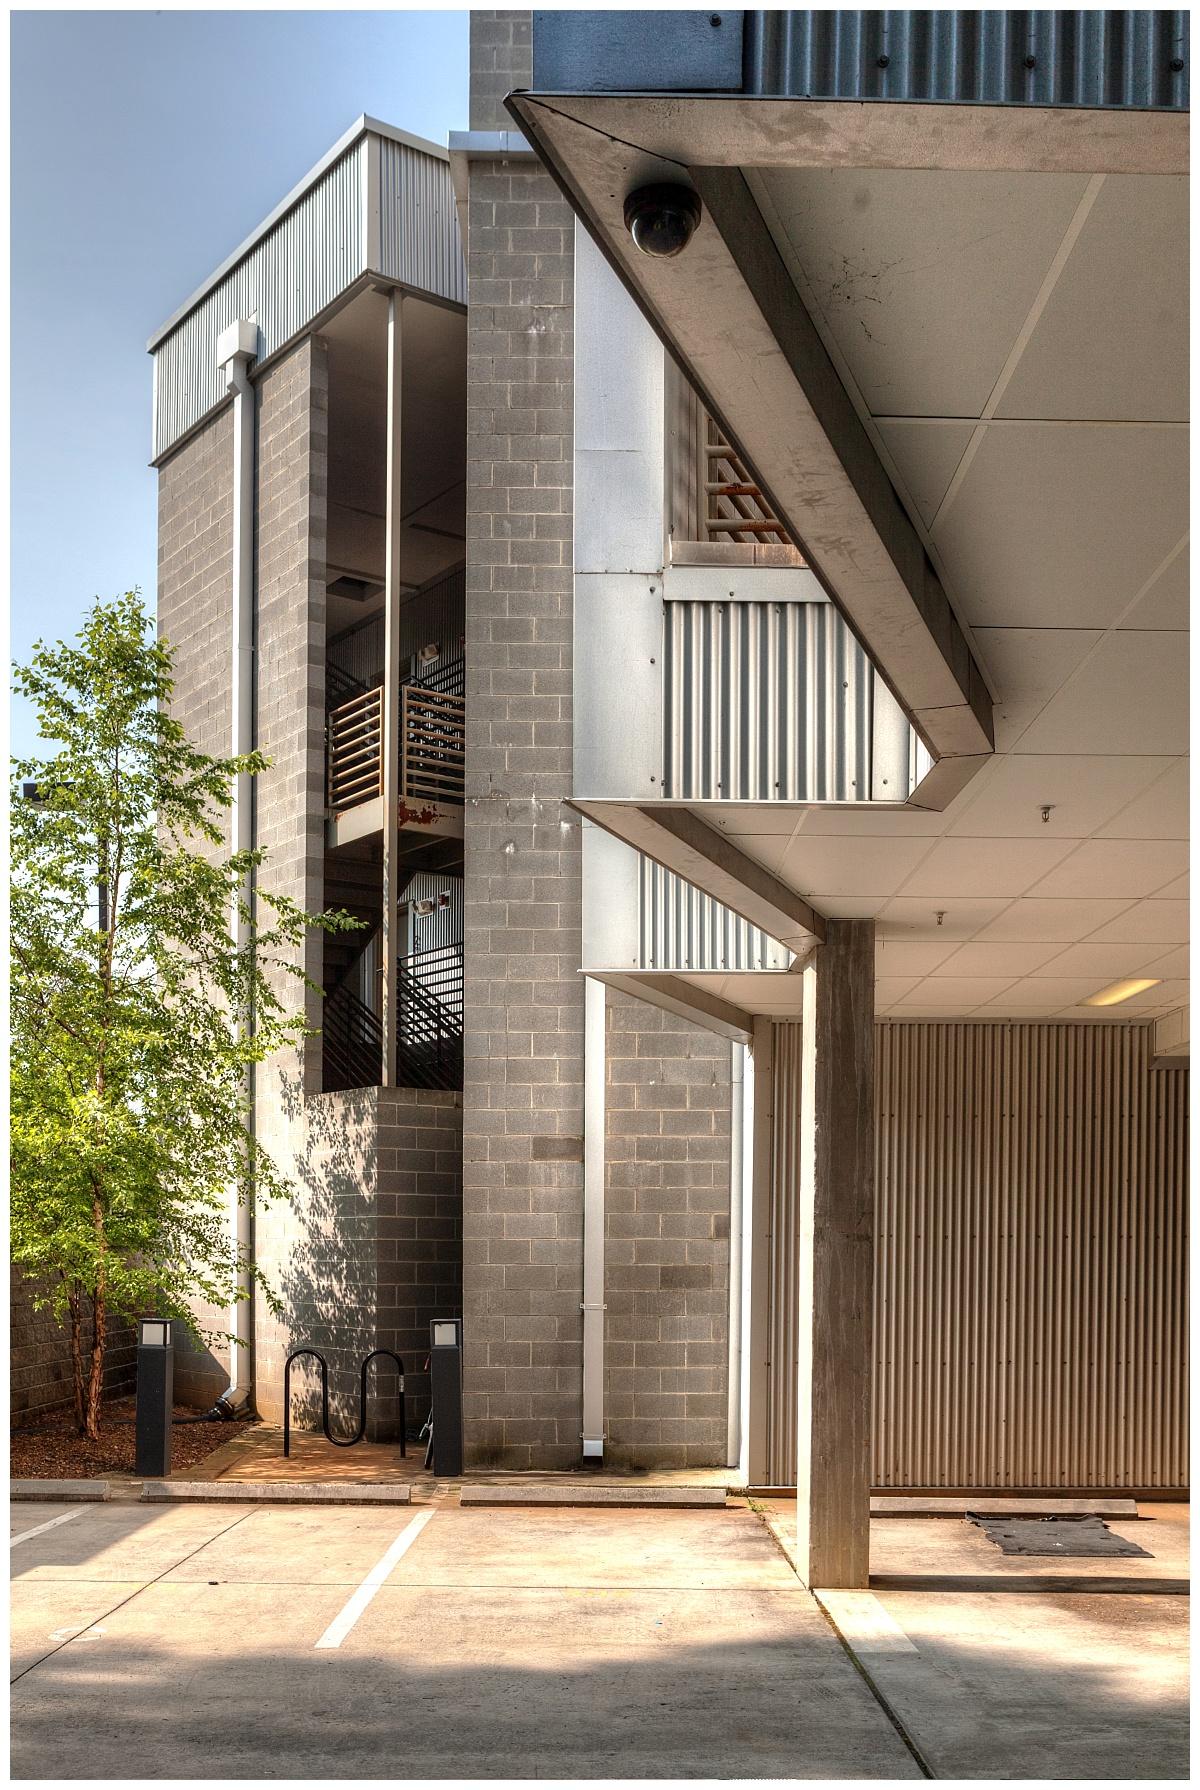 Steelhaus2.jpg